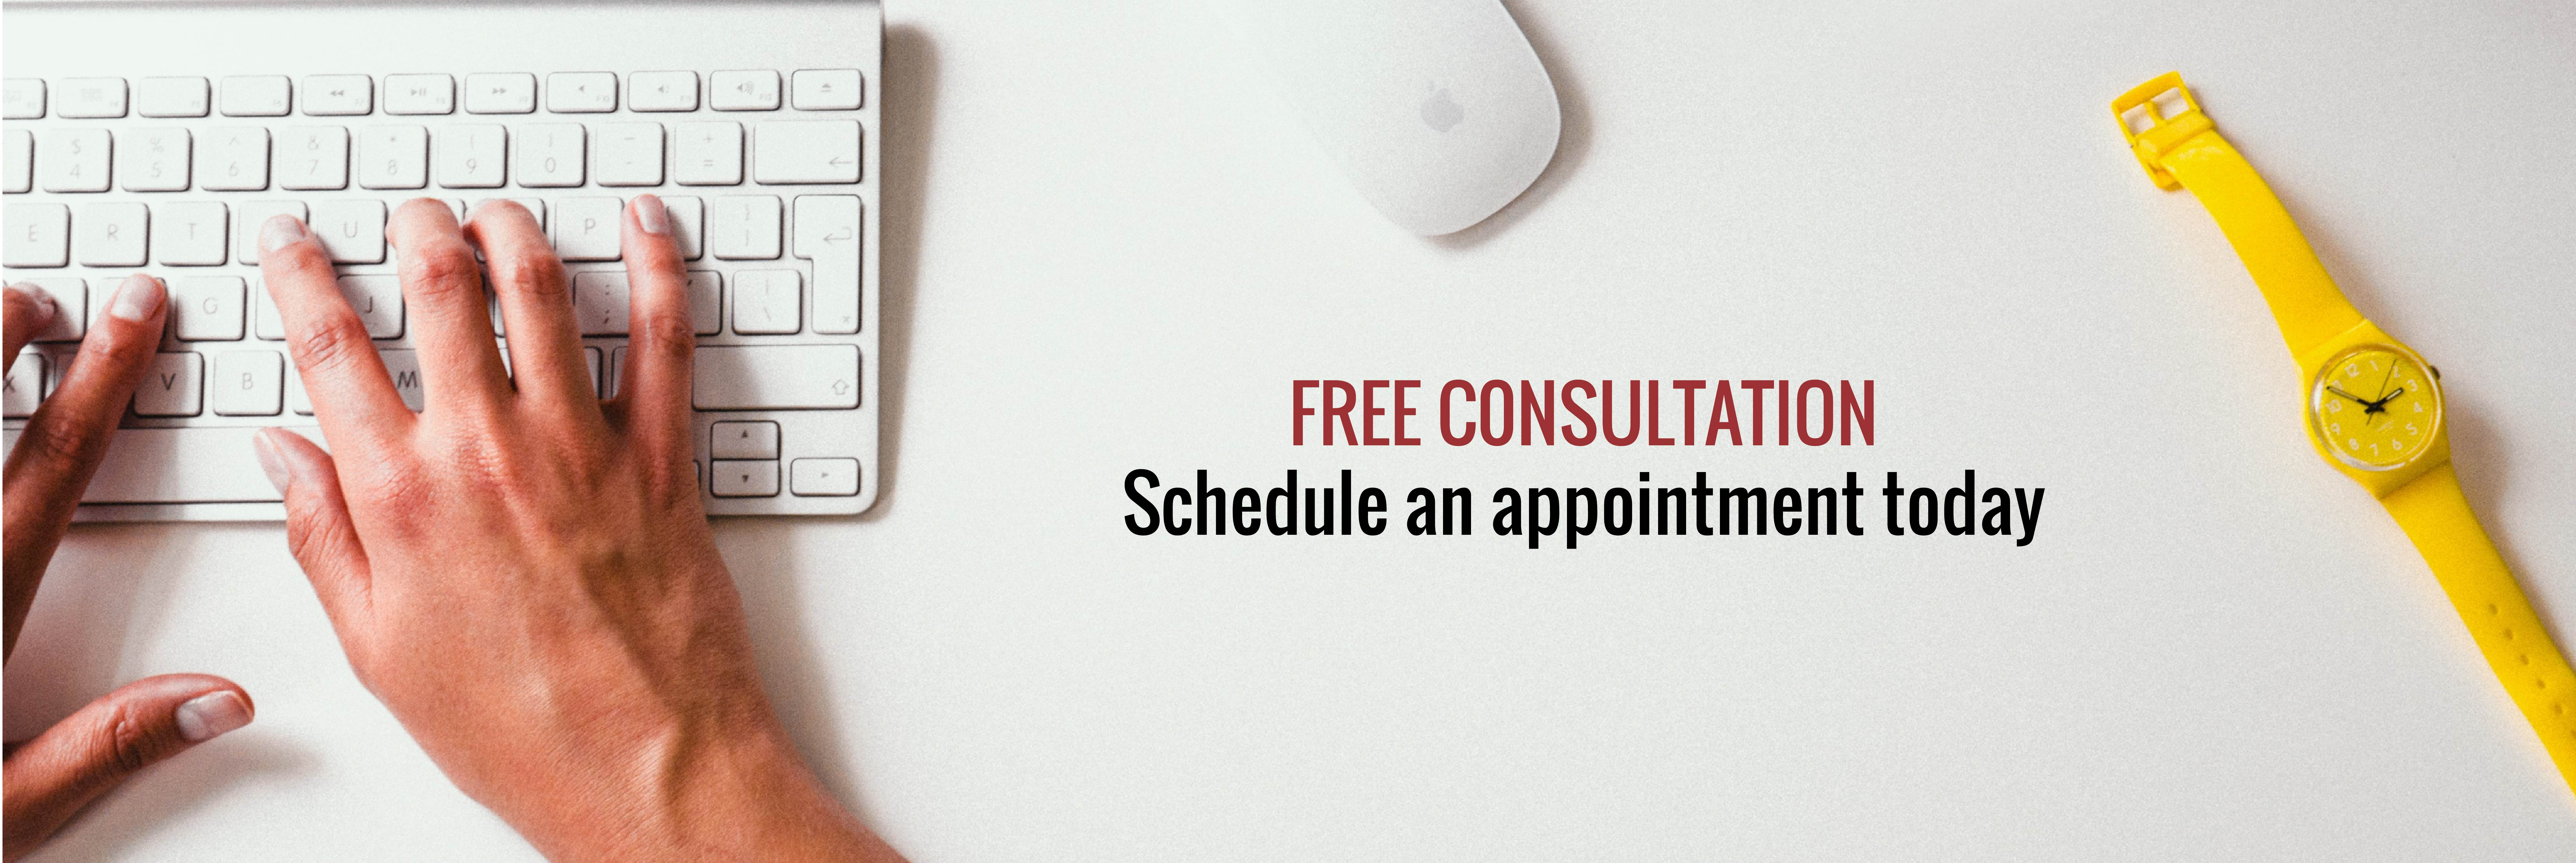 free consultation-01.jpg